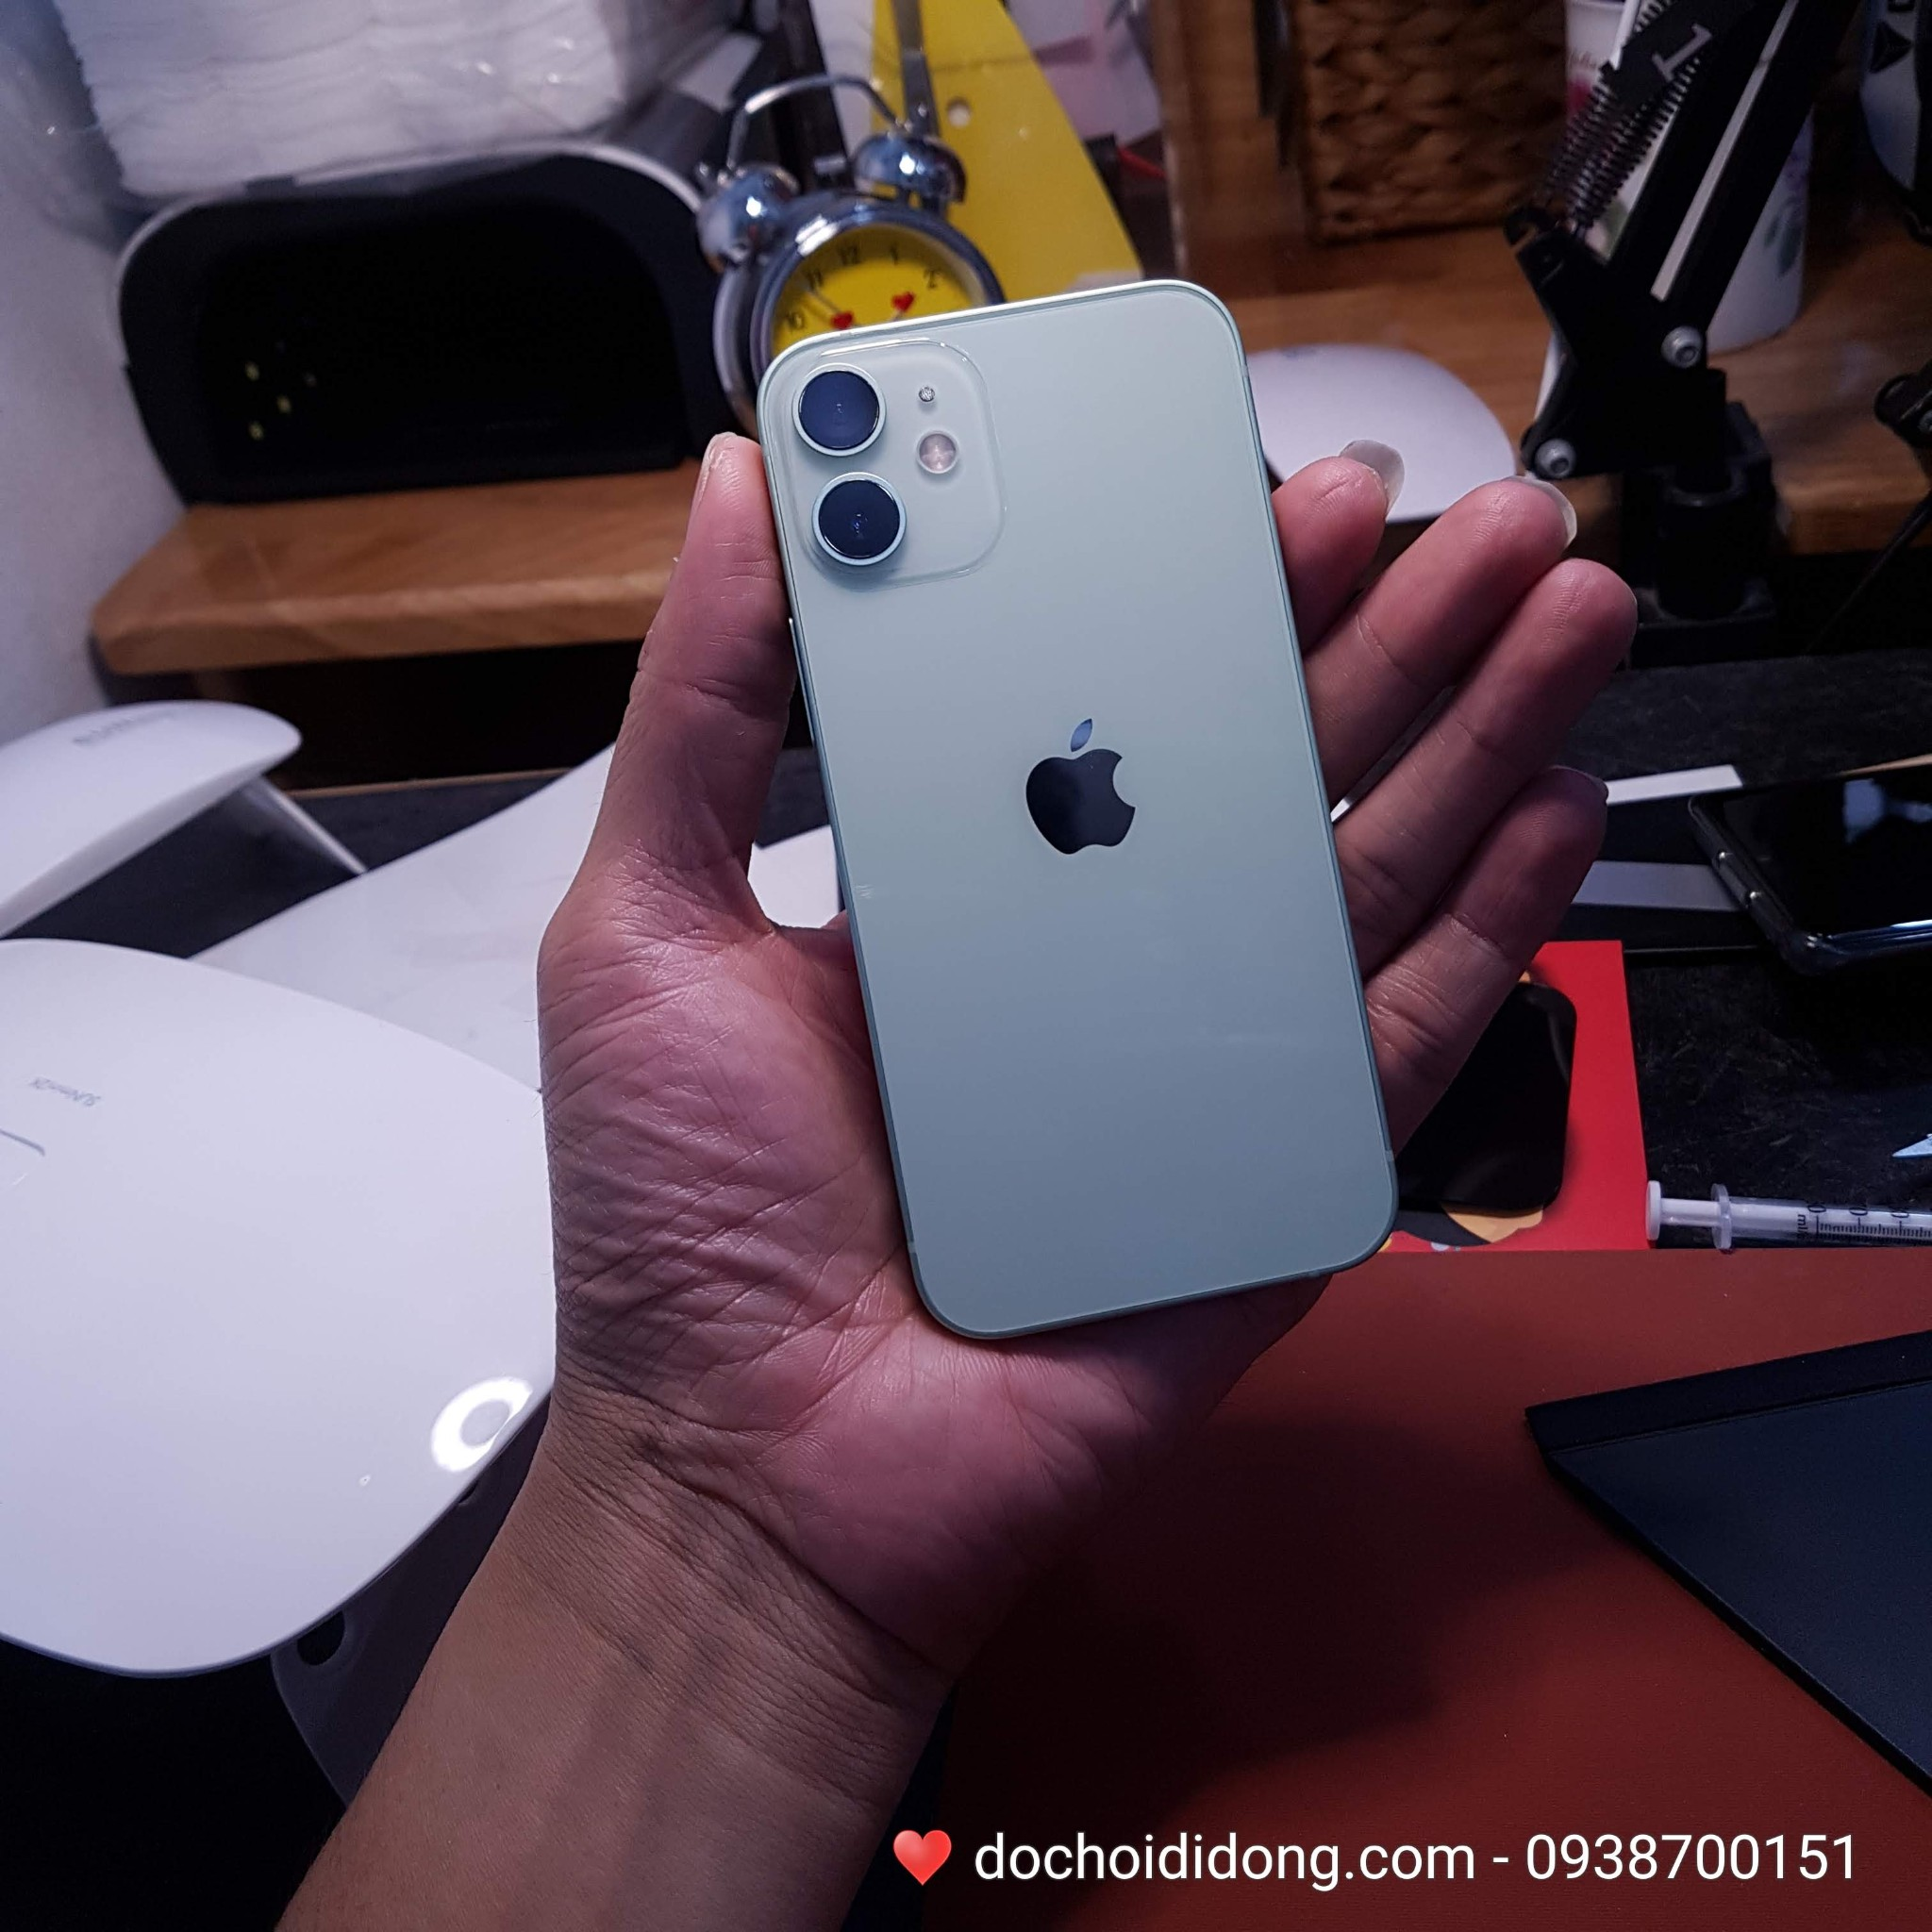 mieng-dan-ppf-rock-iphone-12-mini-trong-nham-doi-mau-cao-cap